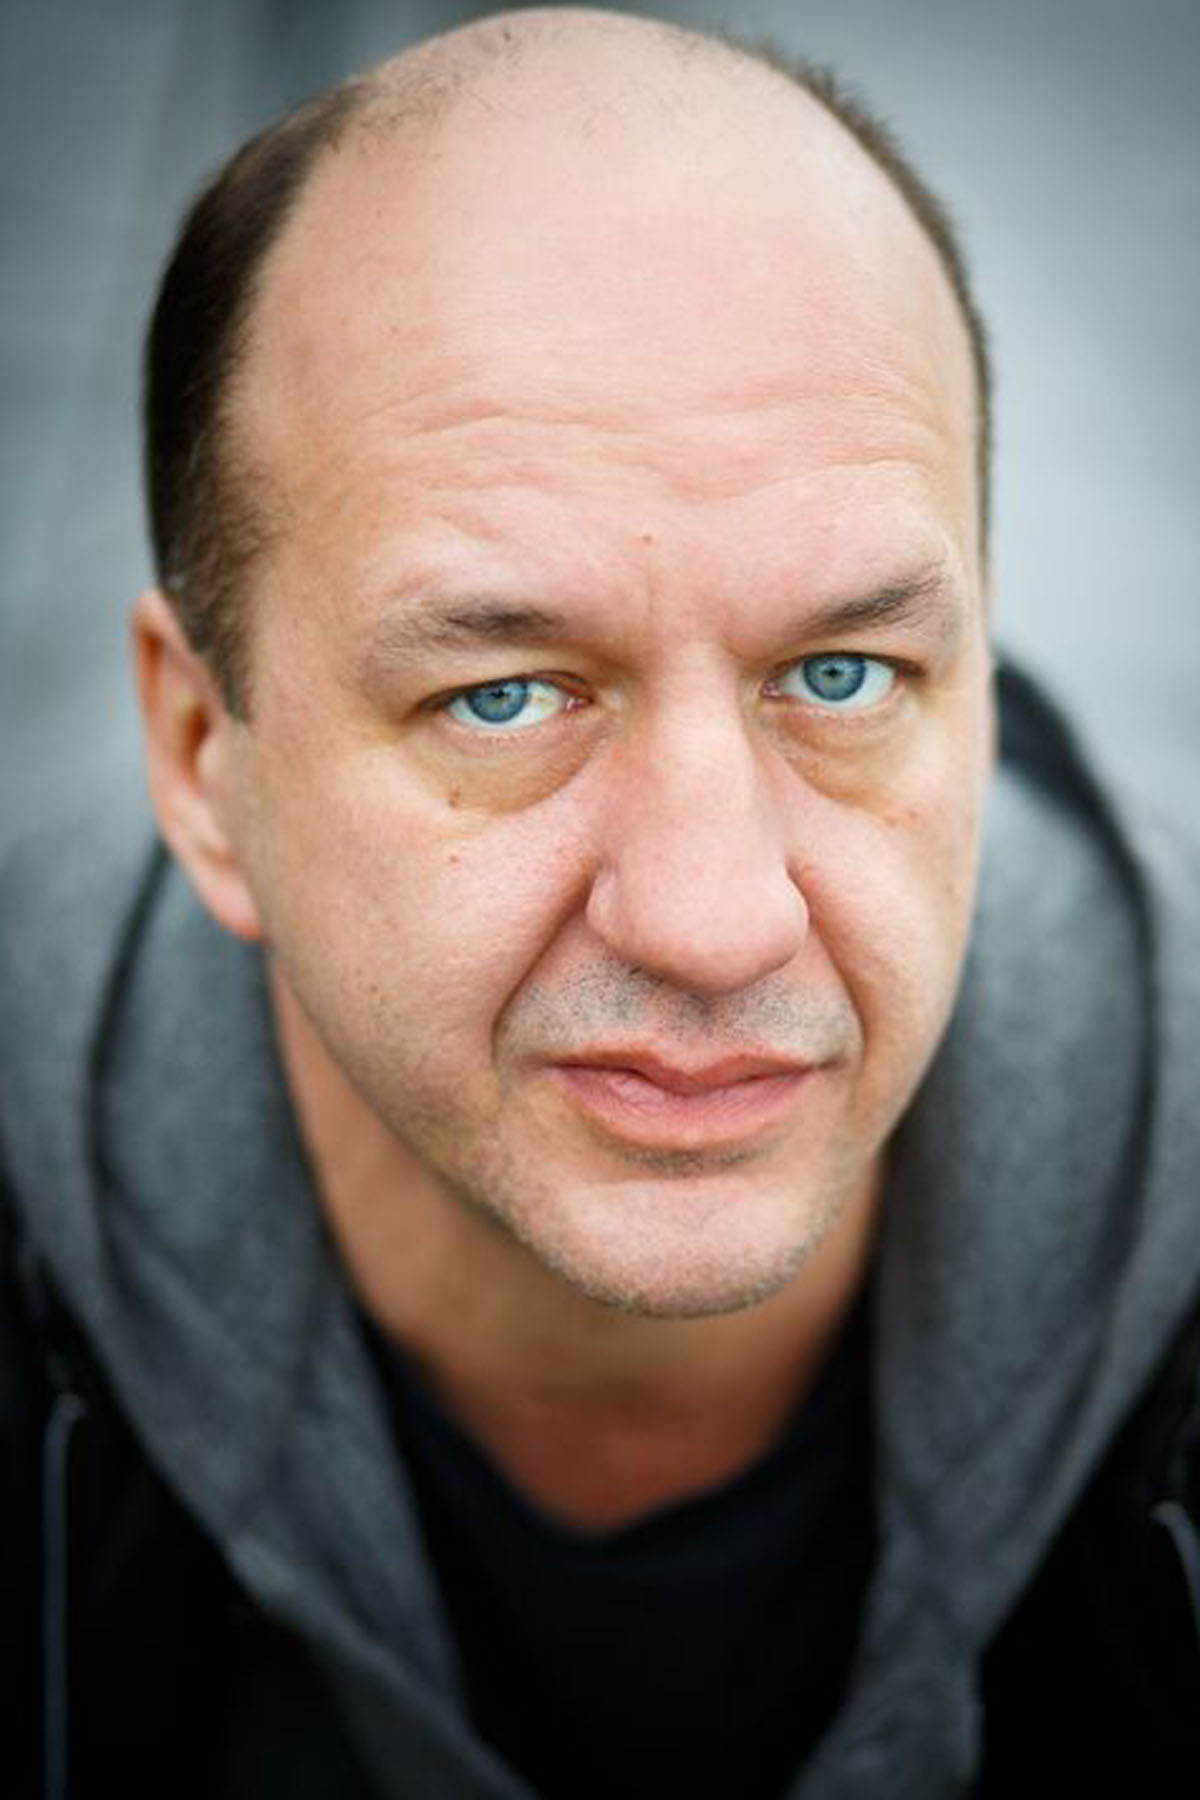 ALEX TONDOWSKI